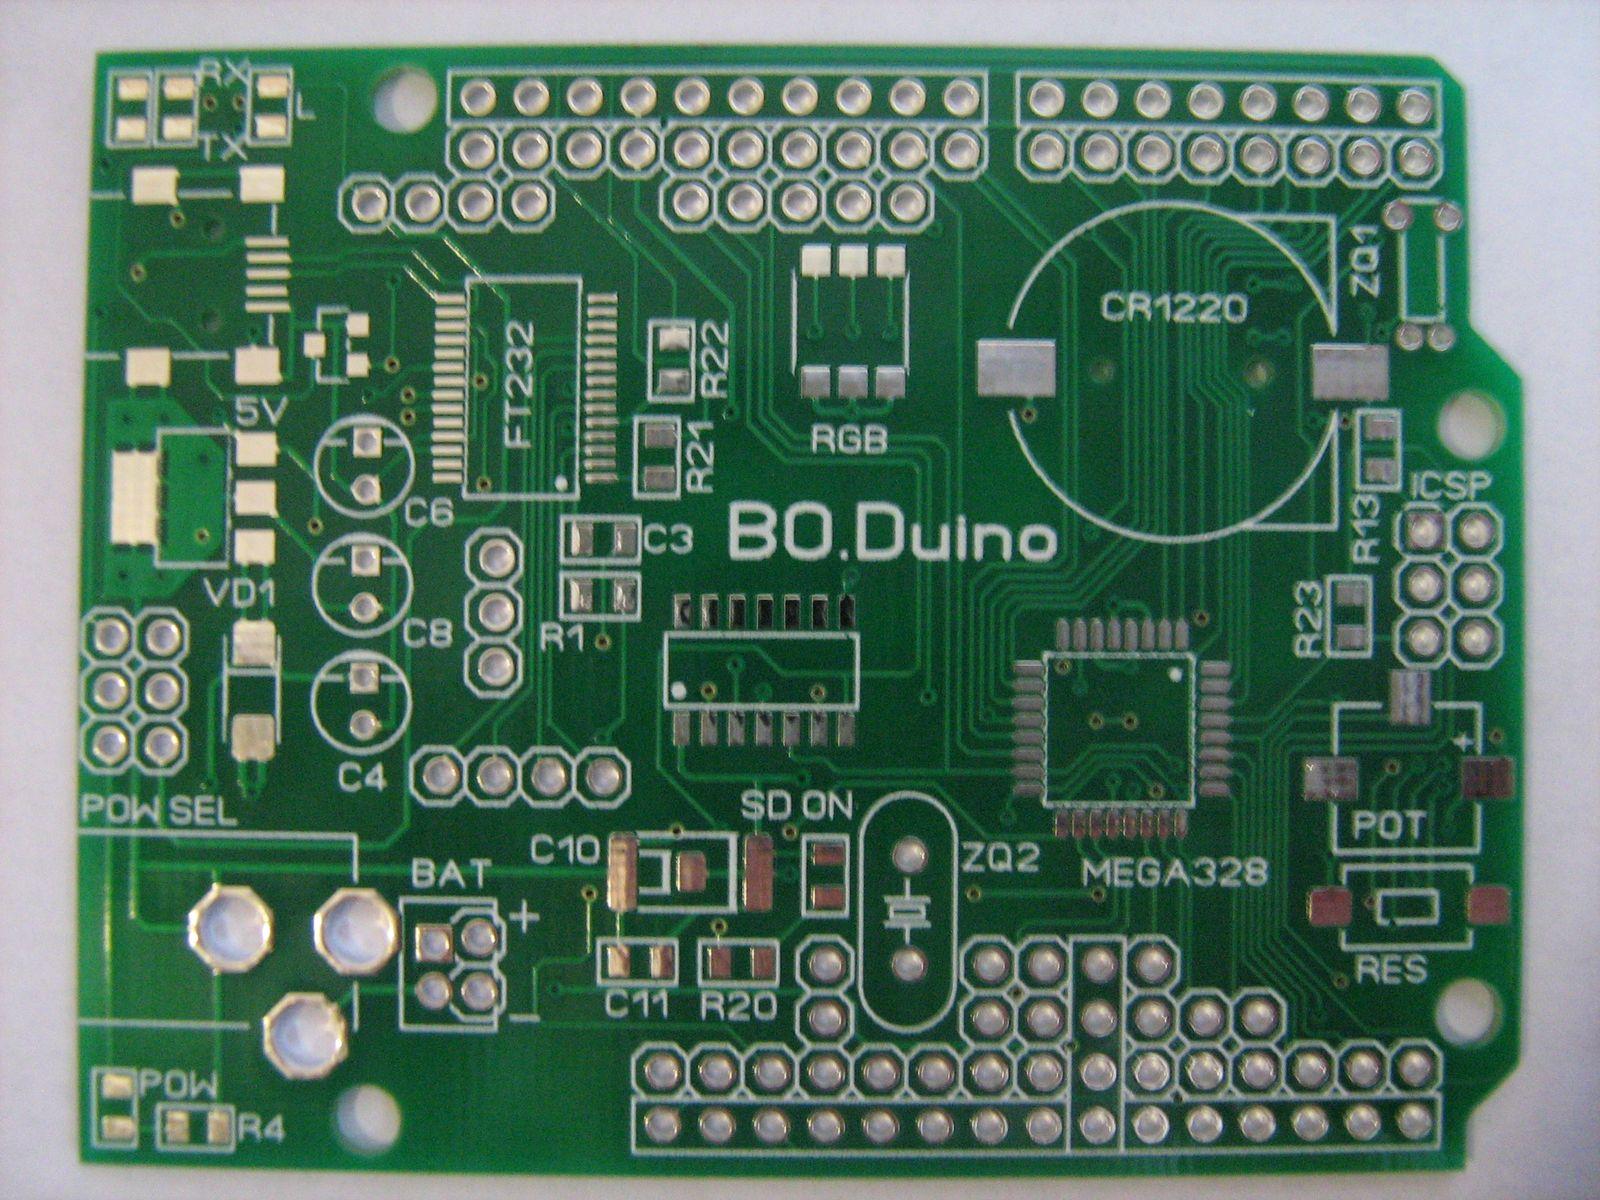 Boduino Atmega328 Arduino Compatible Board Electronics Lab Ft232rl Programming Img 0650